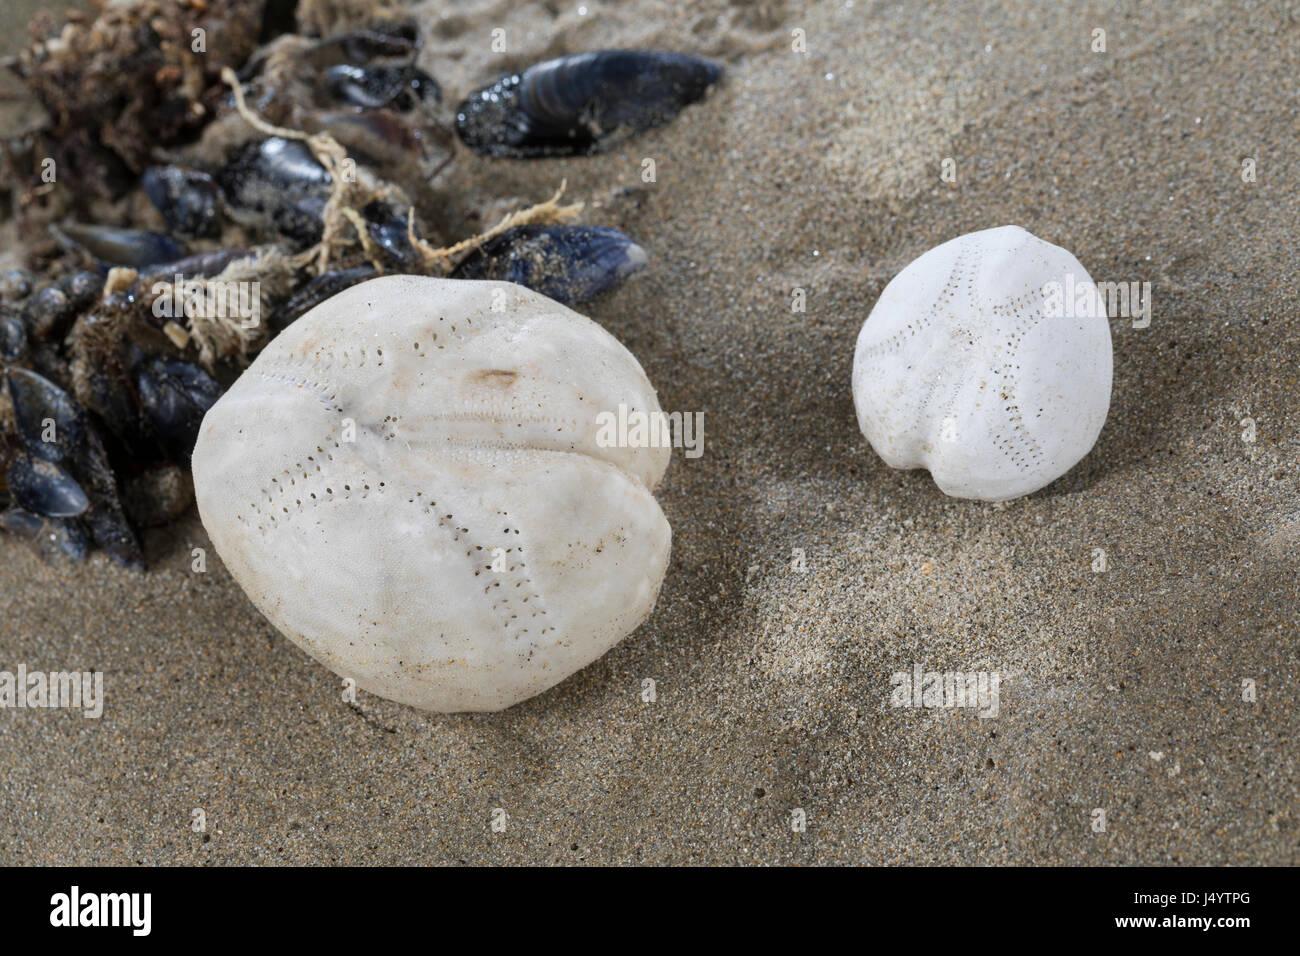 Herz-Seeigel, Herzseeigel, Herzseeigel, Seeigel-Skelett am Strand, Spülsaum, Skelett eines unregelmäßigen - Stock Image